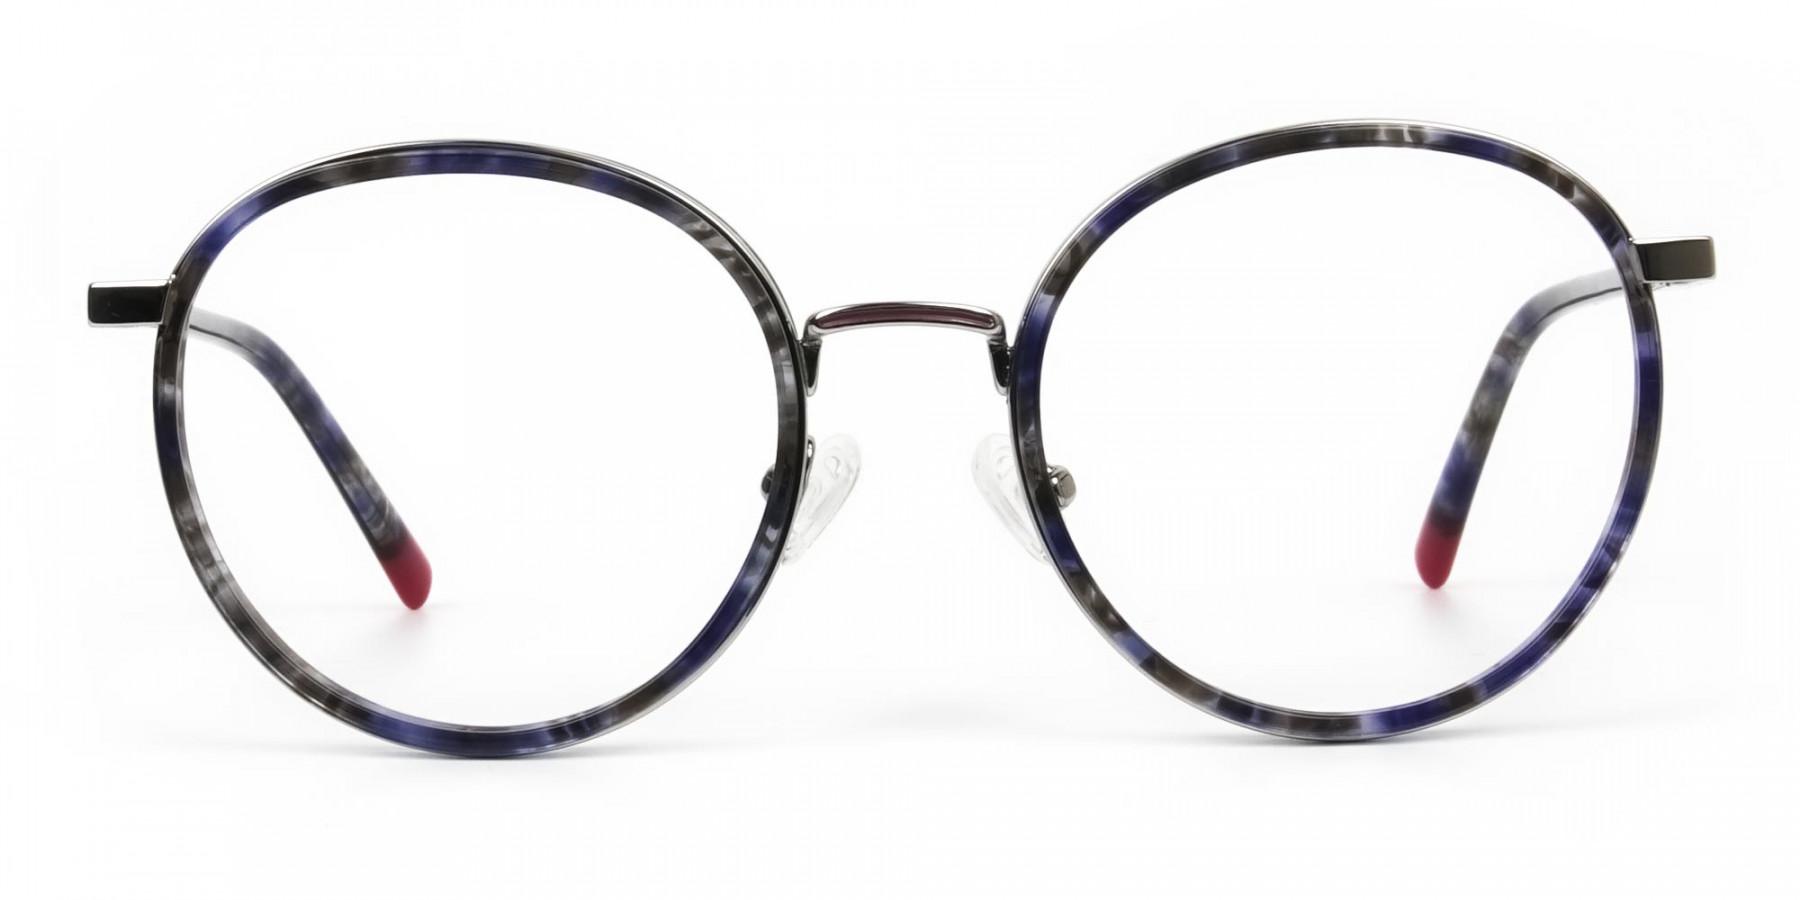 Ocean Blue Tortoise & Silver Eyeglasses - 1